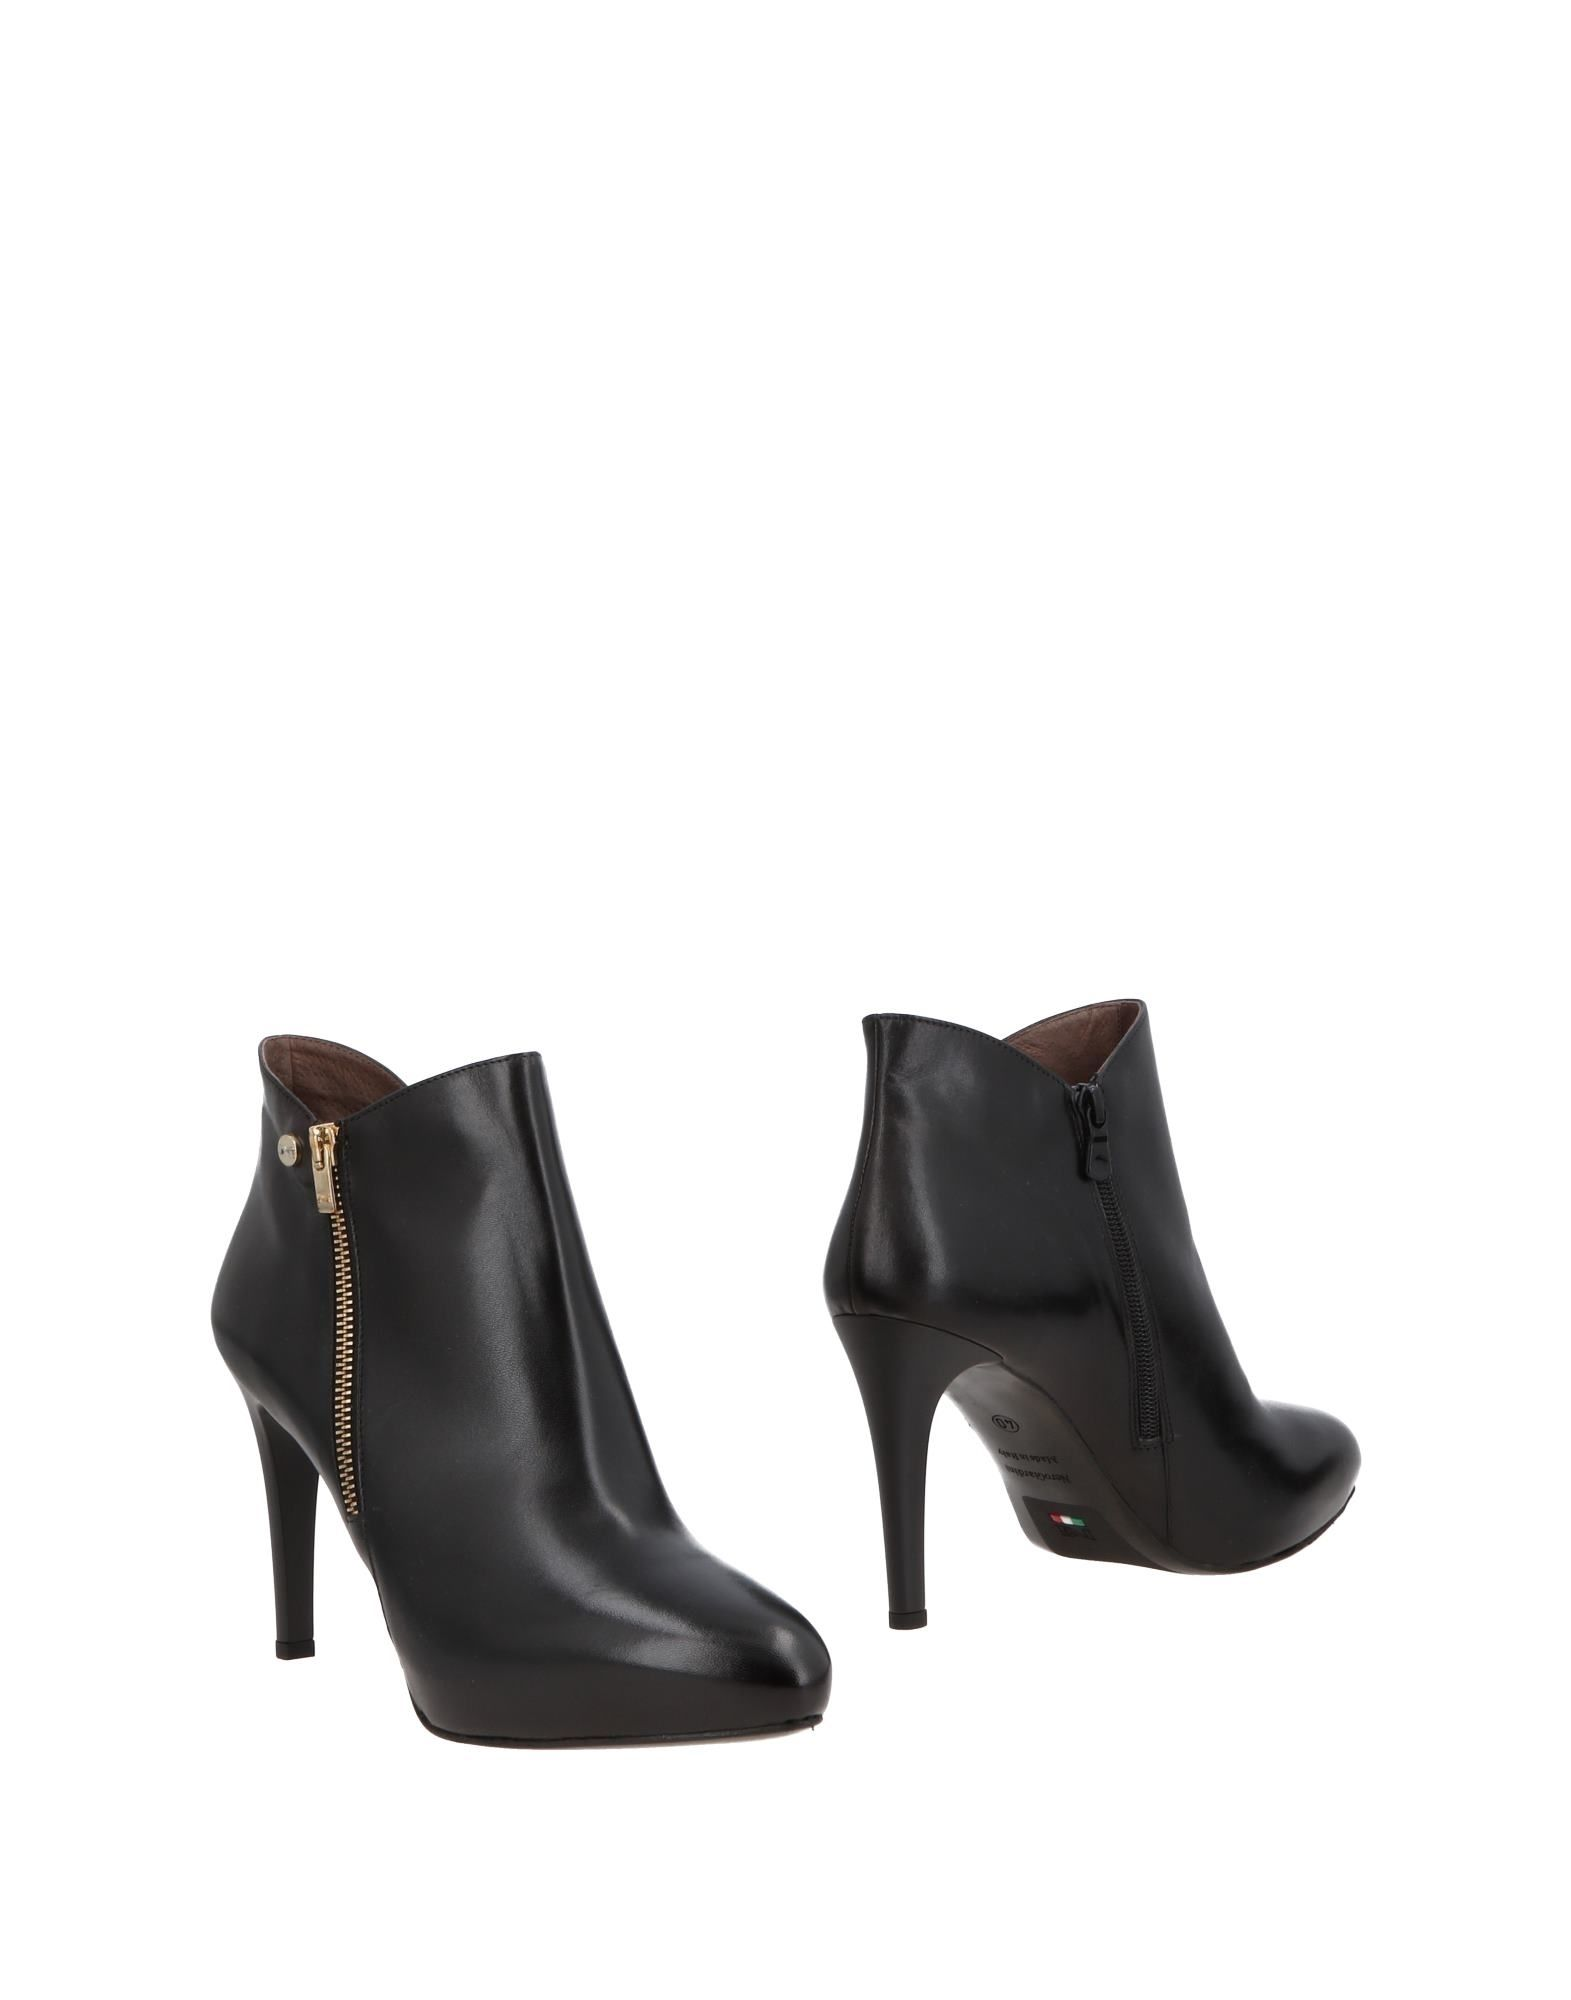 Nero Giardini Stiefelette Damen  11487571EL Gute Qualität beliebte Schuhe